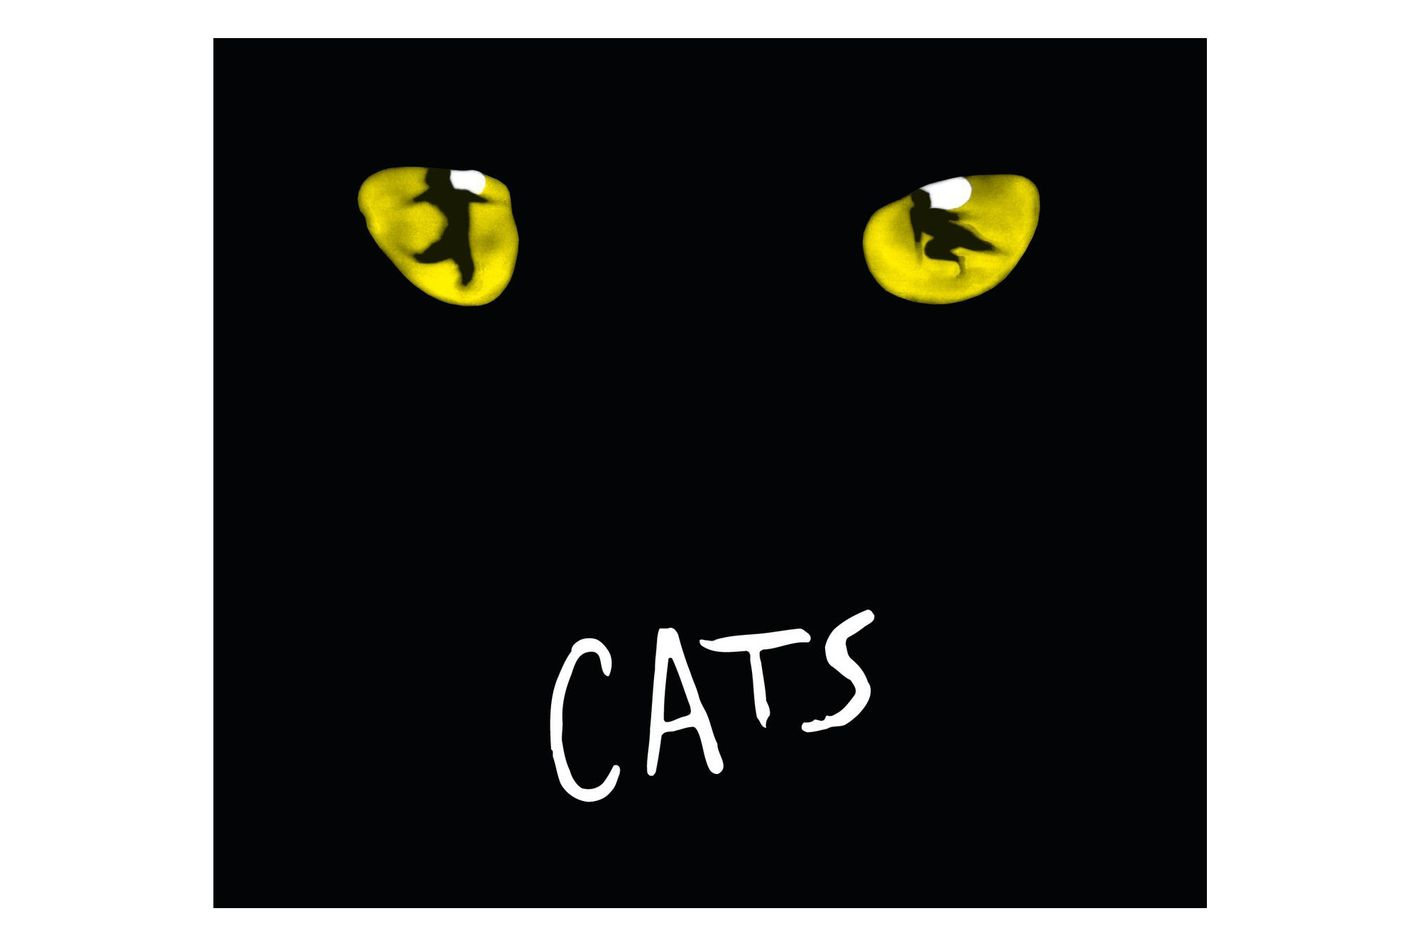 Cats: Original Cast Recording 1981 — Original London Cast